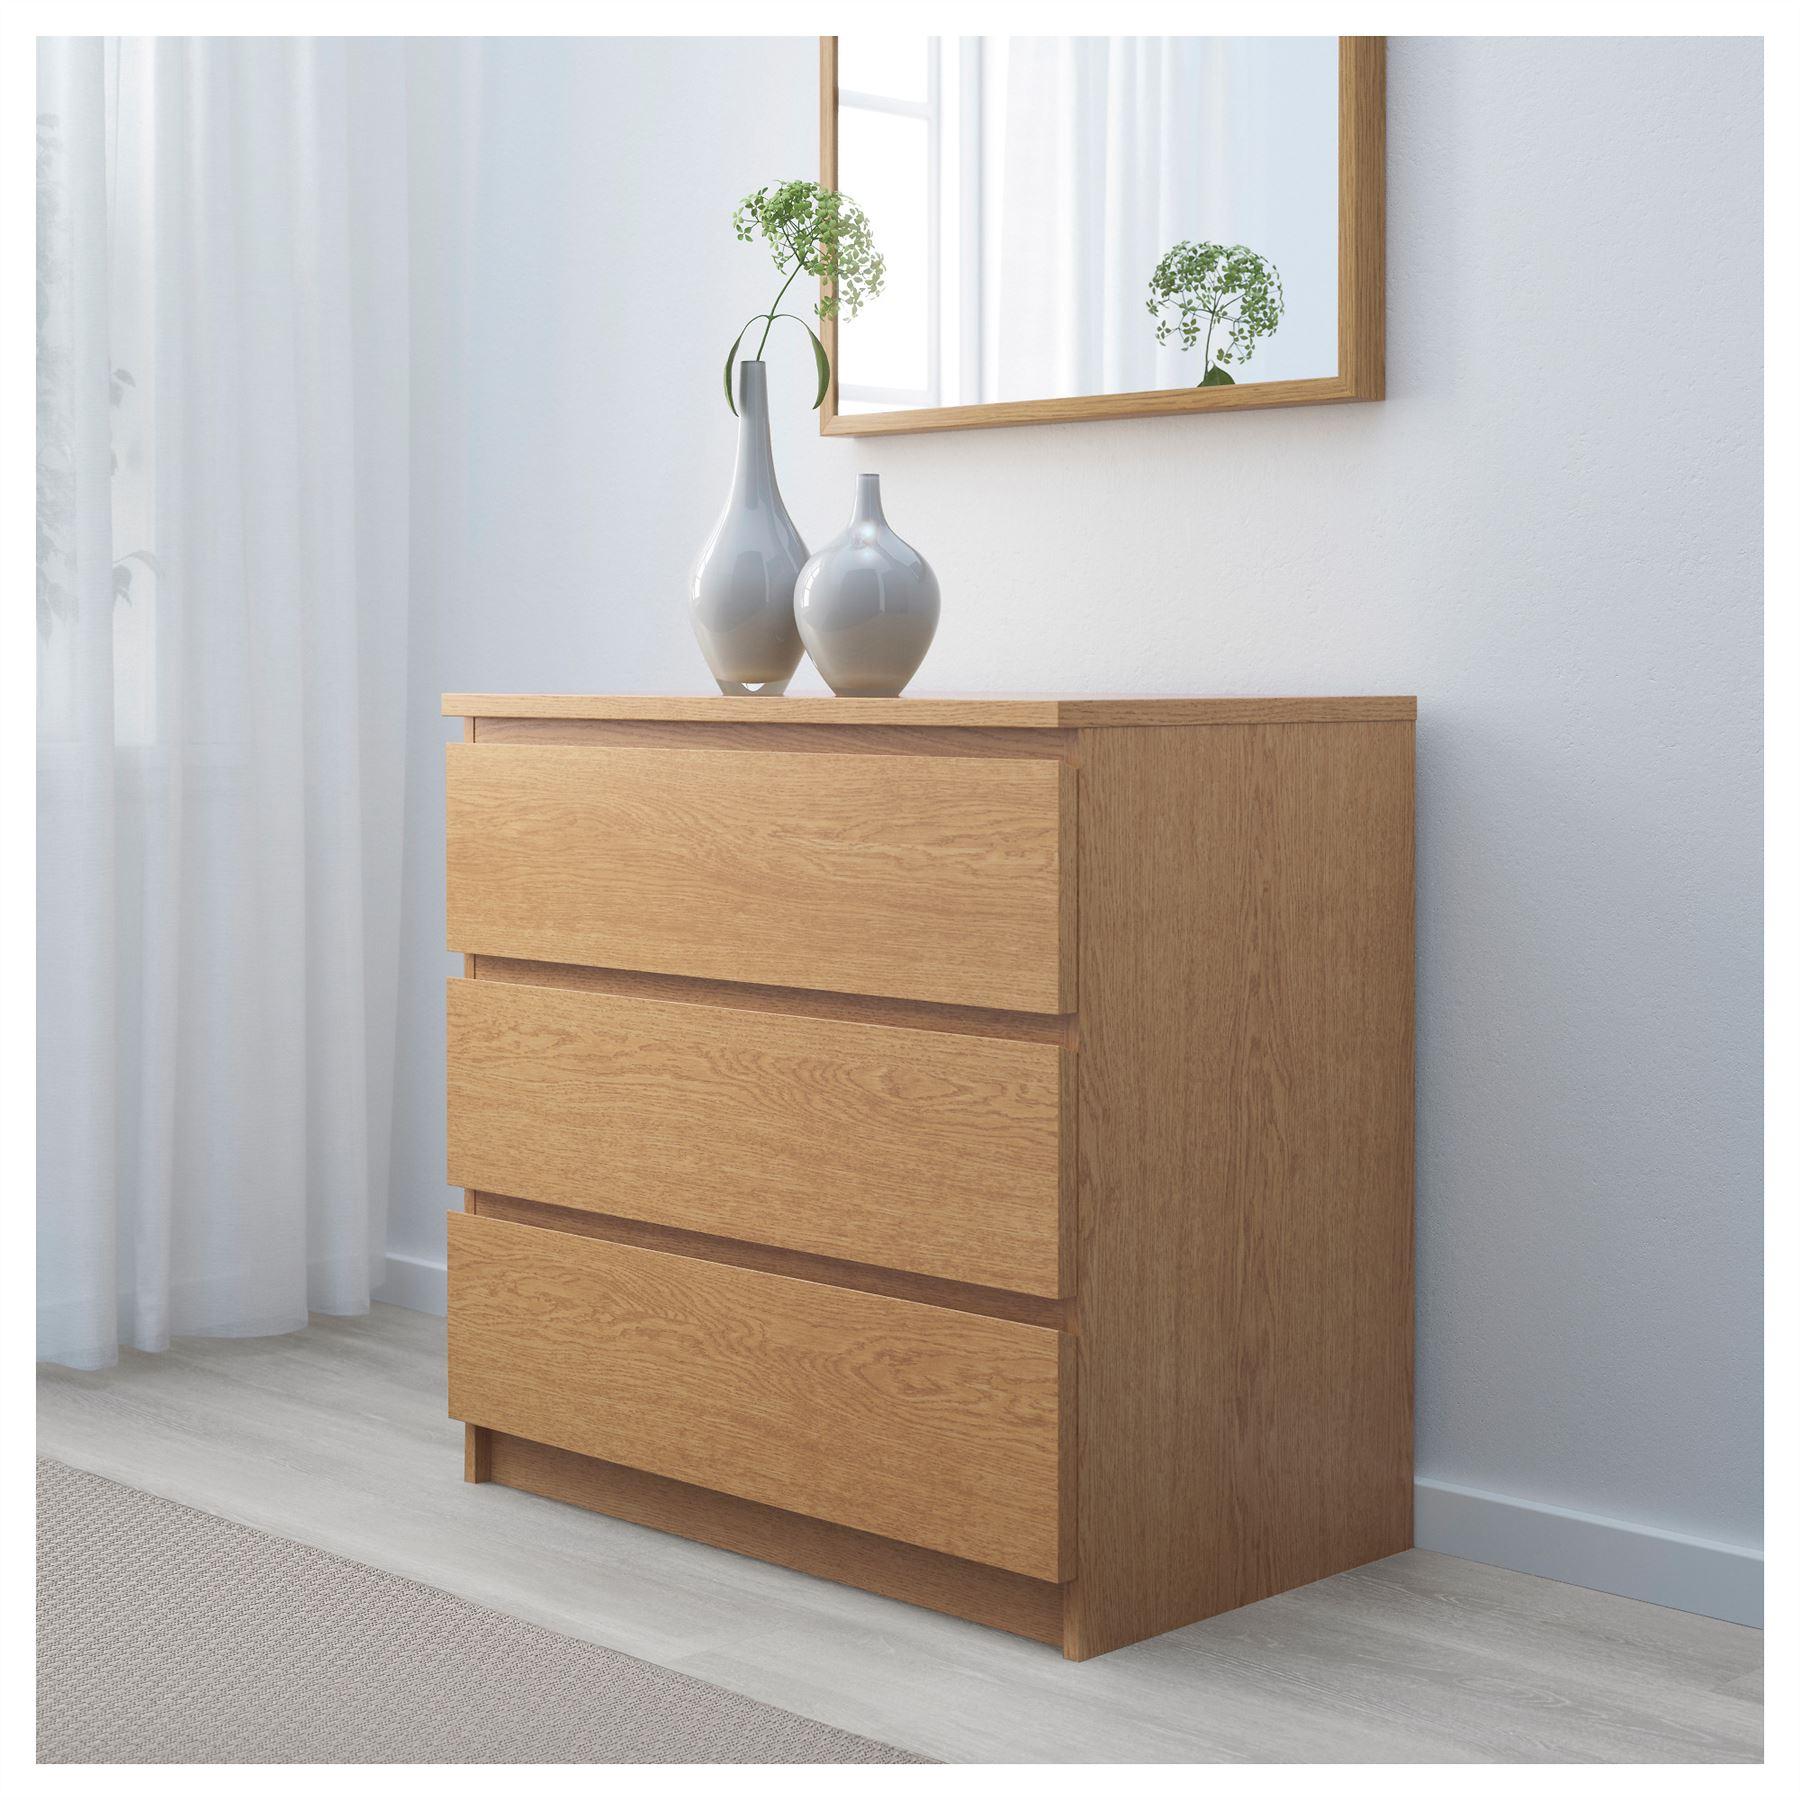 Ikea Malm Chest Of 3 Drawers 80x78cm Oak Veneer Bedroom